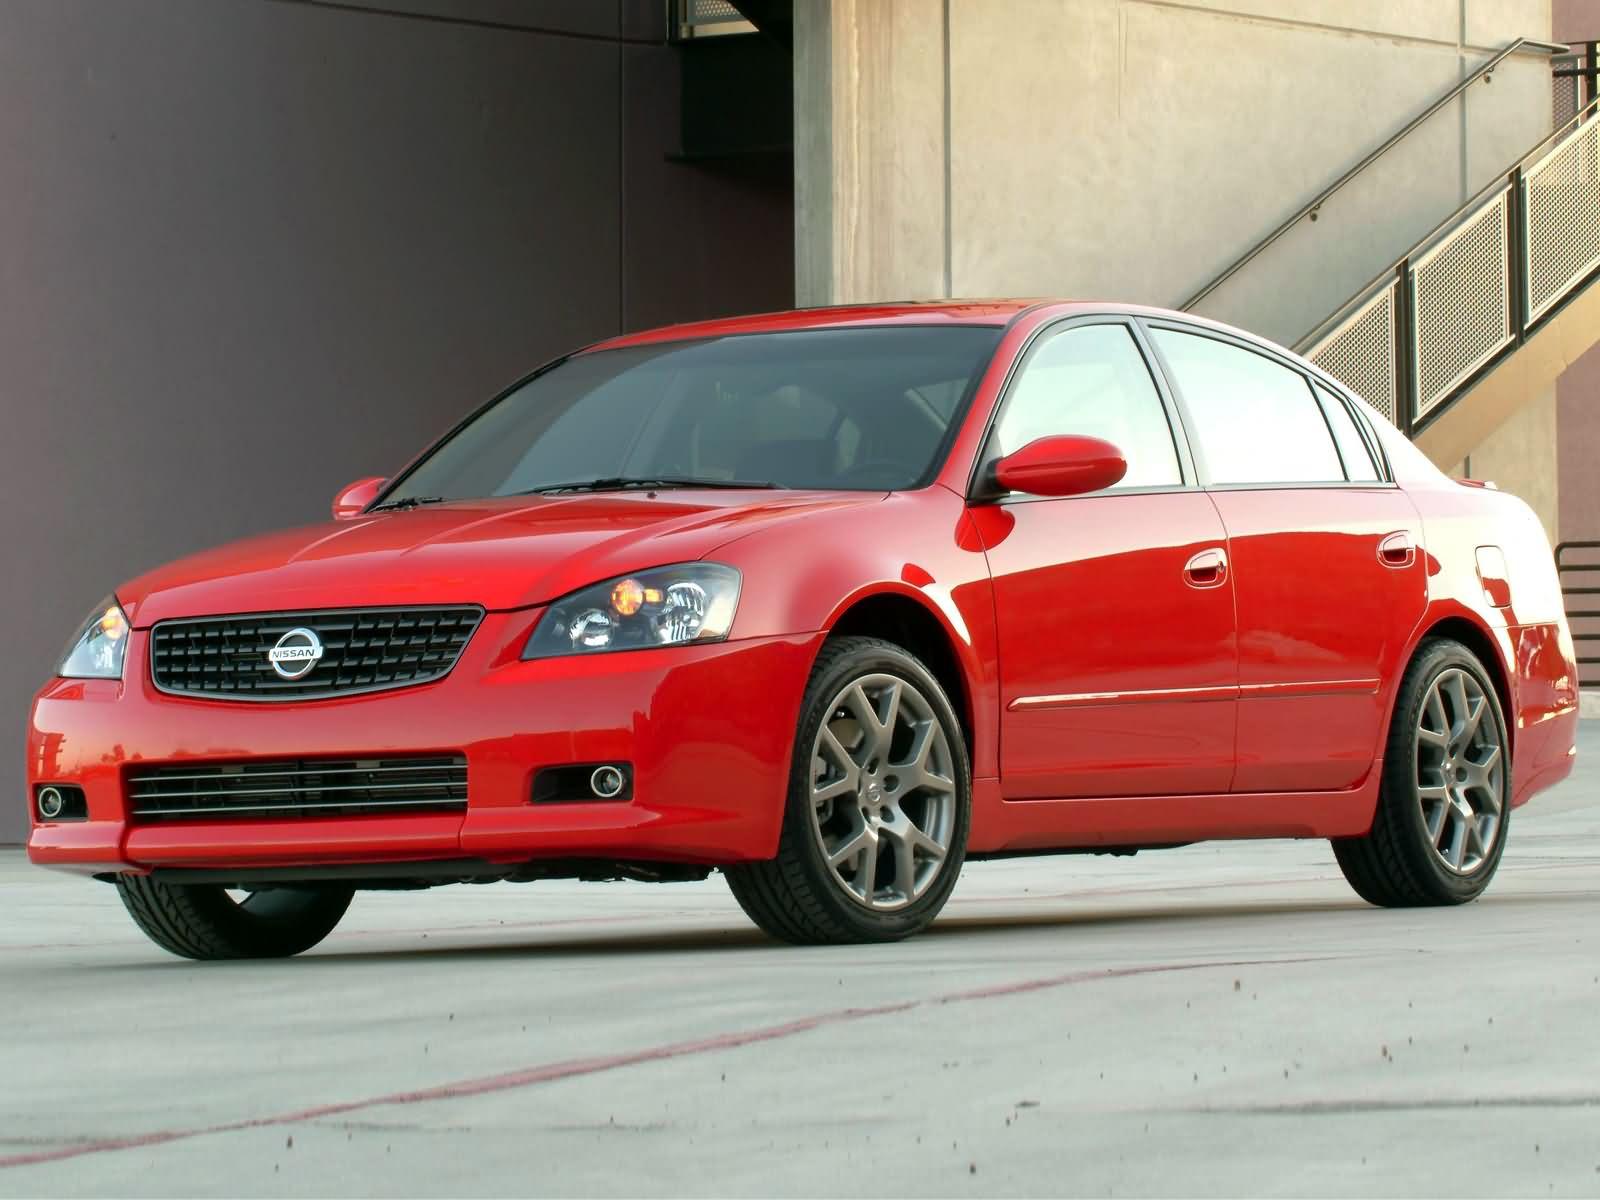 altima nissan ser 2005 2006 2002 2004 se autoevolution 2003 cars specs